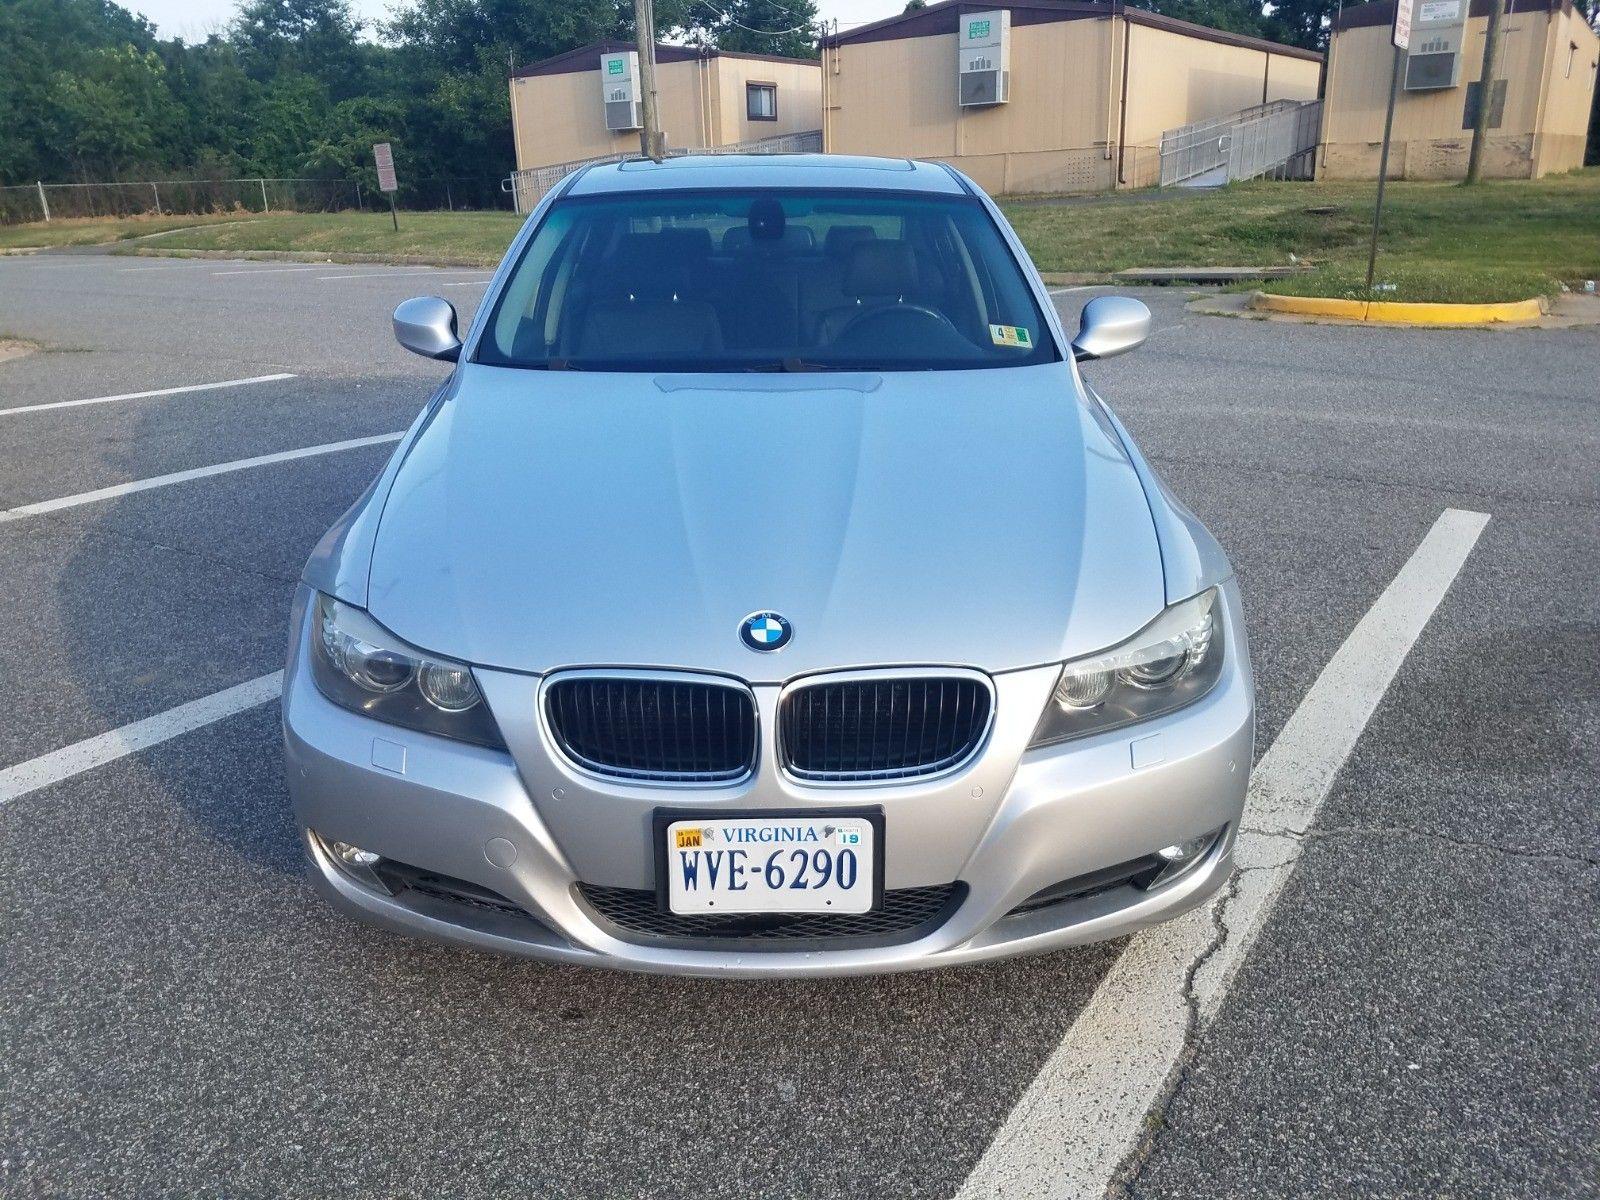 Used 2009 Bmw 3 Series X Drive Ebay Motors Used Cars Suv 2018 2019 Mycarboard Com